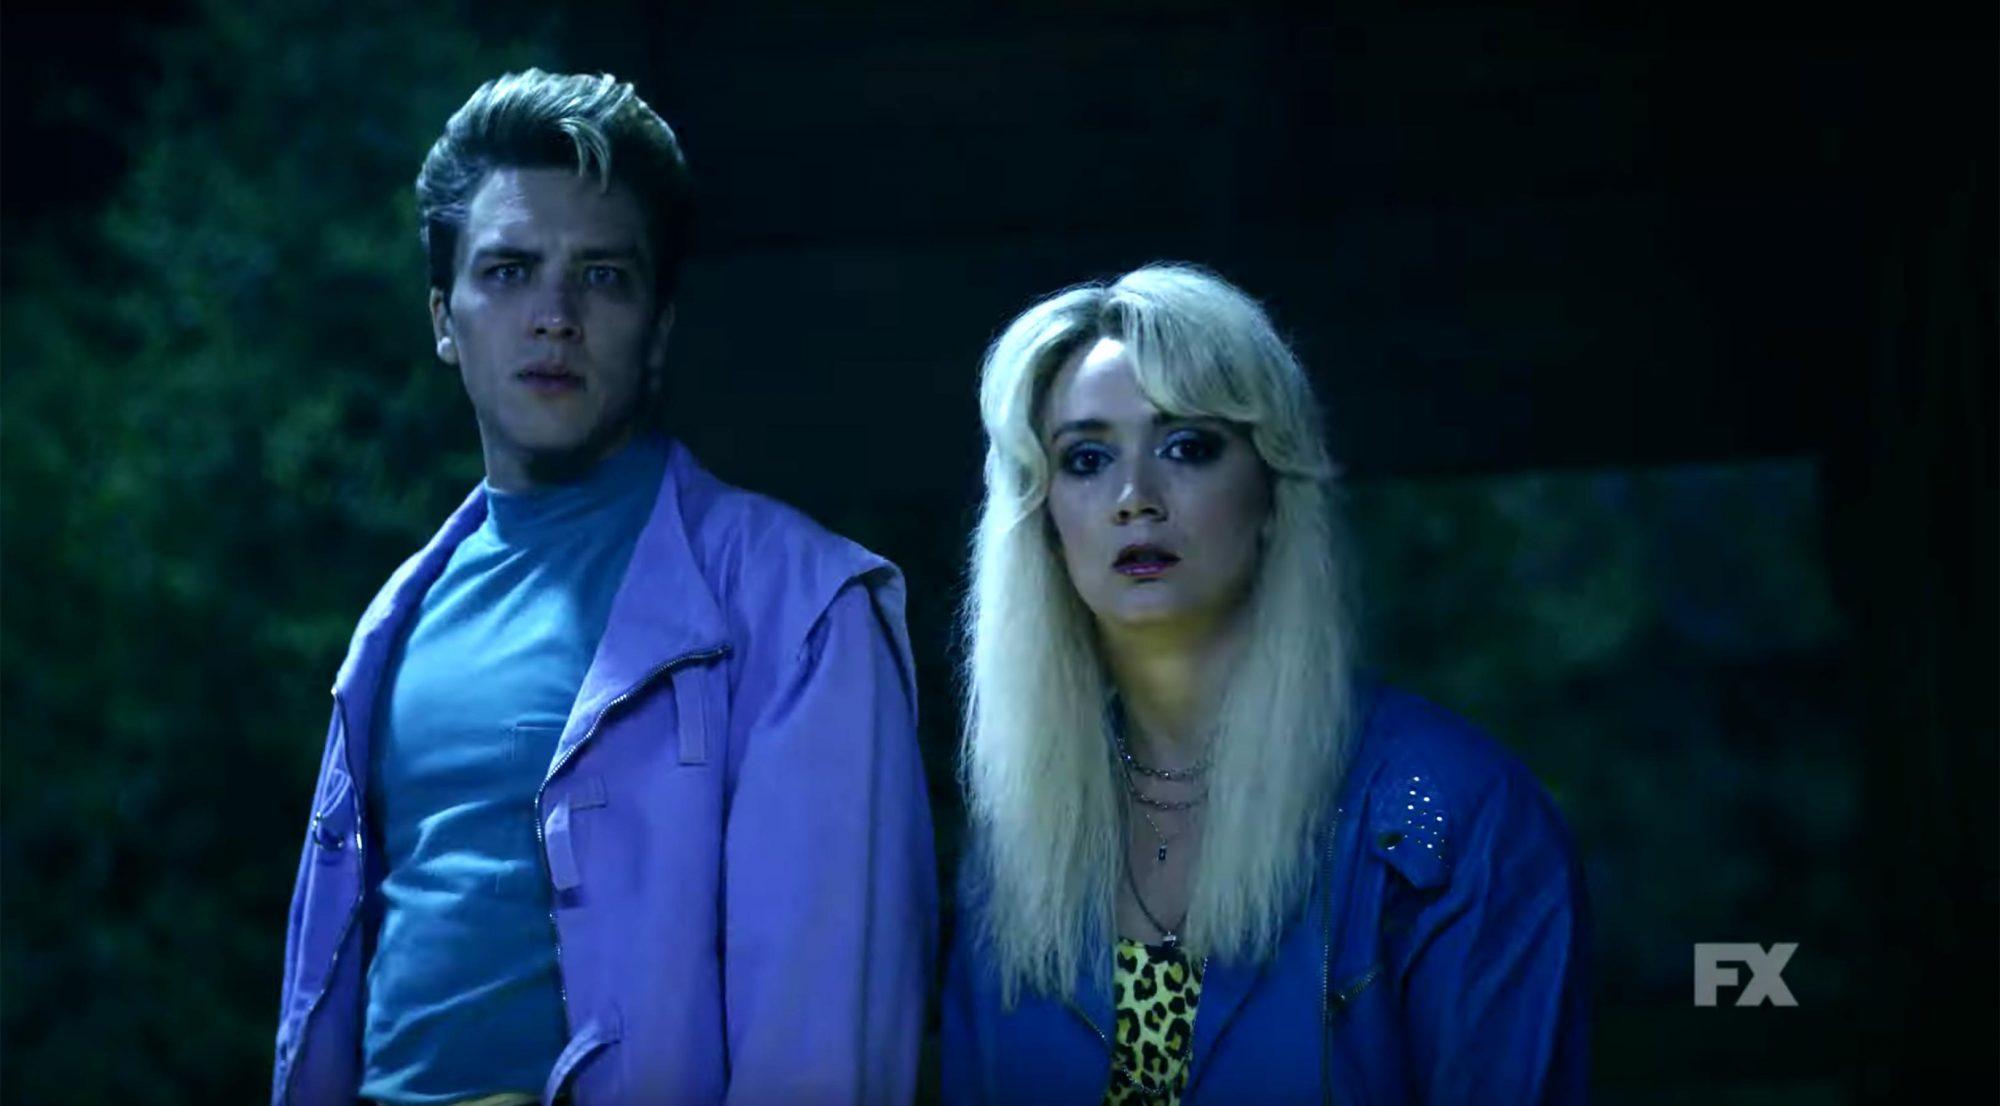 American Horror Story: 1984 | Season 9 Ep. 3: Slashdance Preview | FX (screen grab) https://www.youtube.com/watch?v=CvcXAiidMiw CR: FX